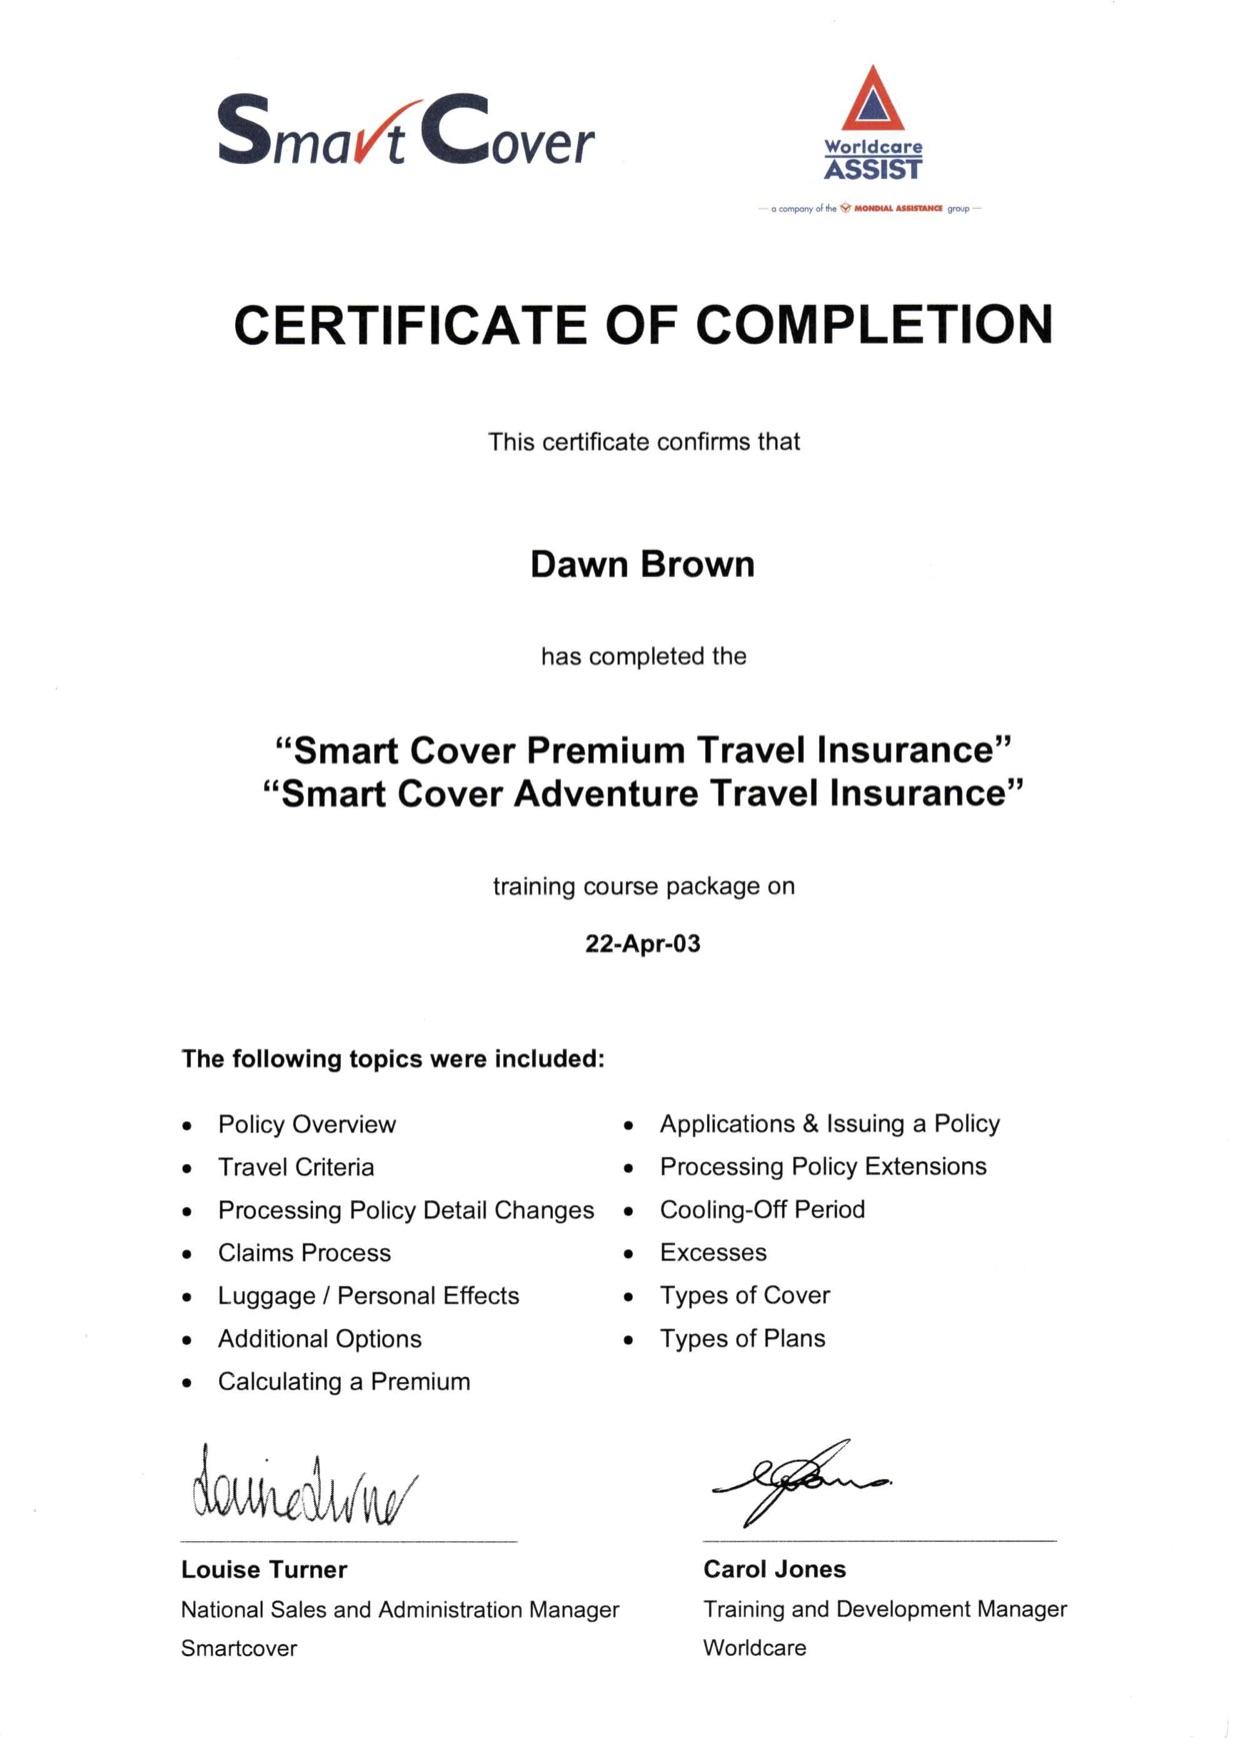 Smart cover premium travel insurance certificate